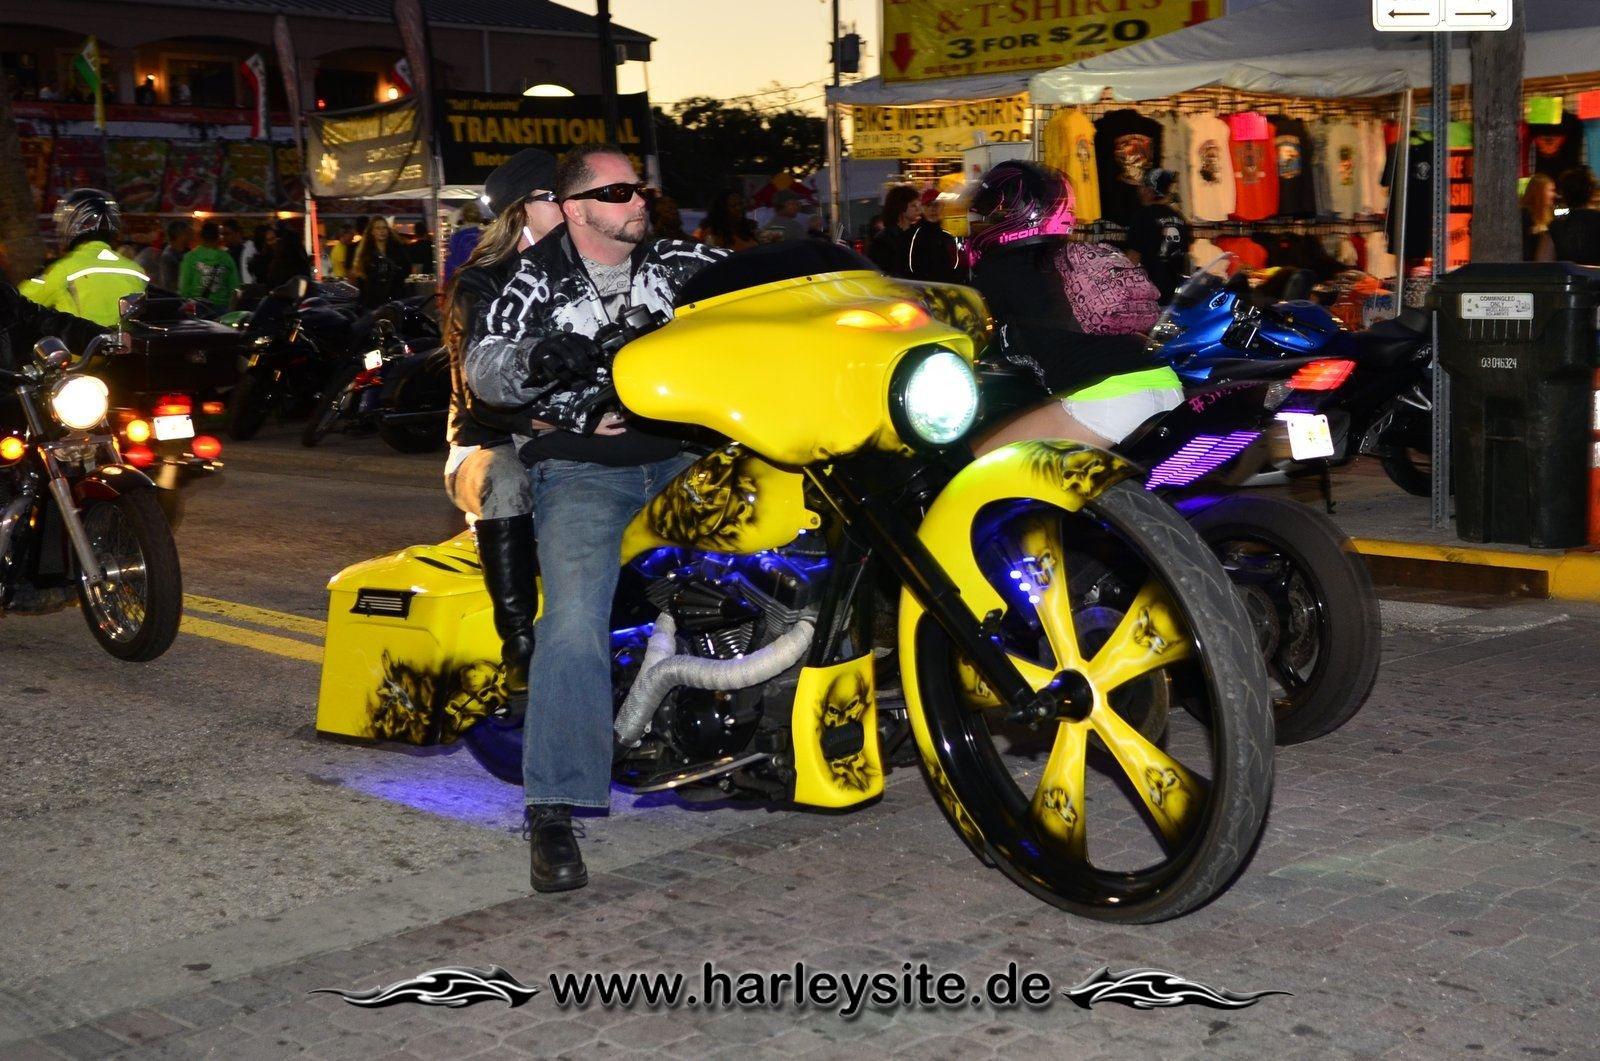 Erster Sonntag Daytona-2013 39